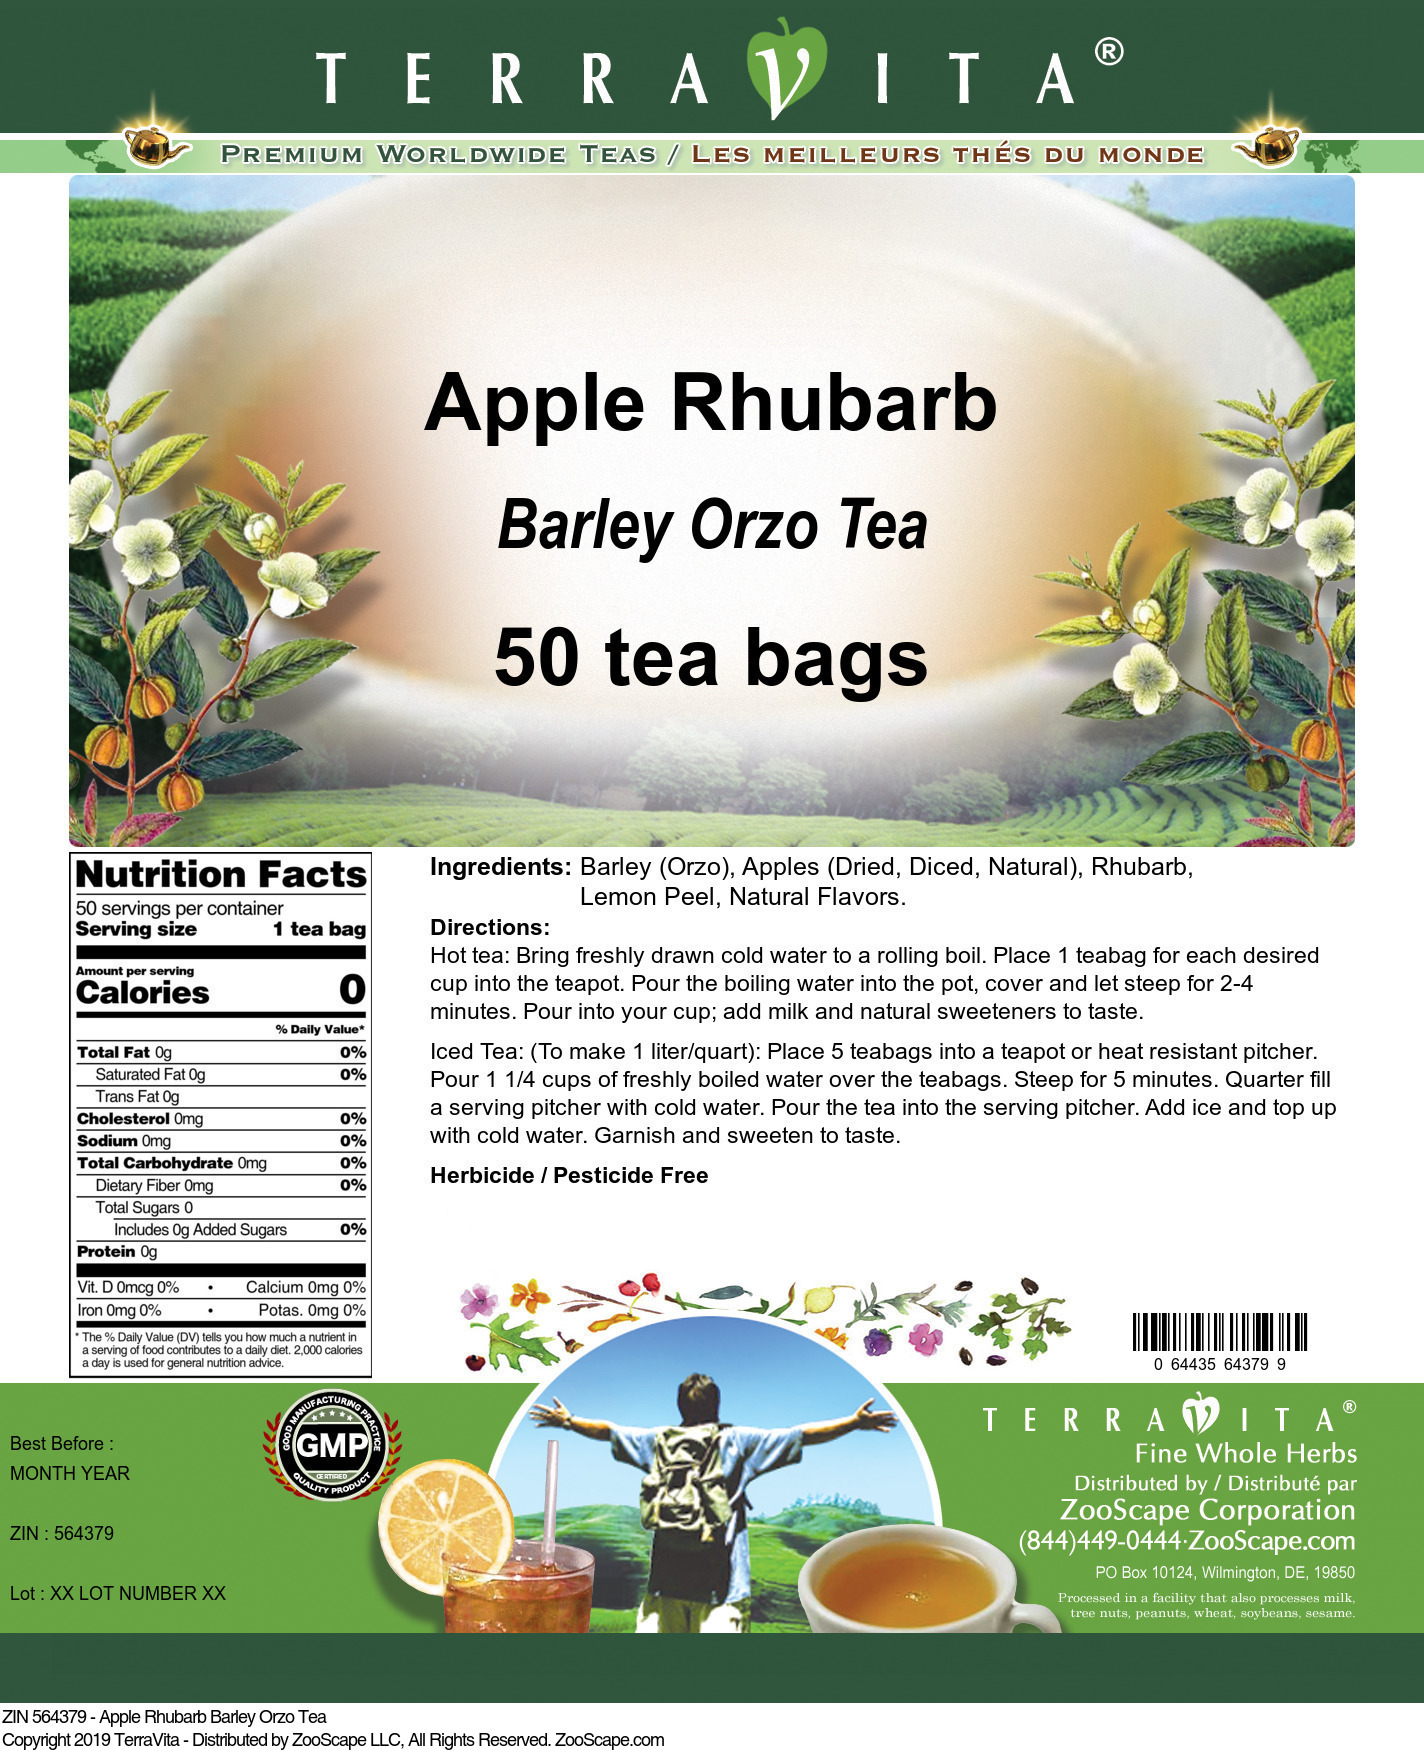 Apple Rhubarb Barley Orzo